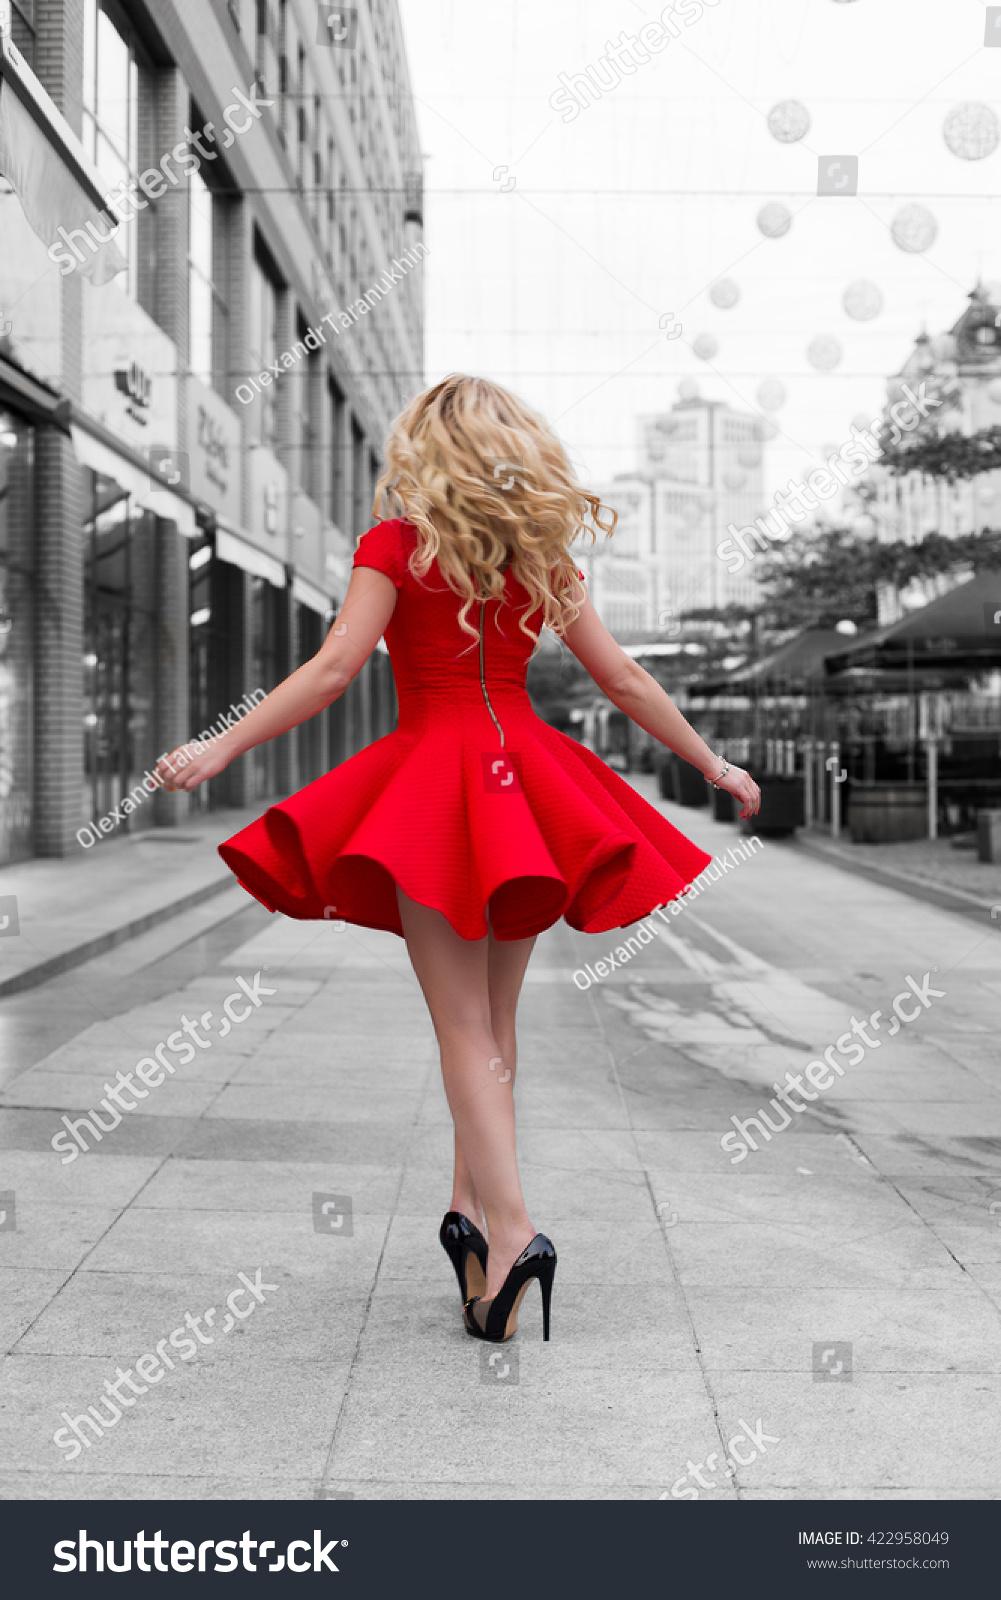 Beautiful Blonde Woman Red Dress High